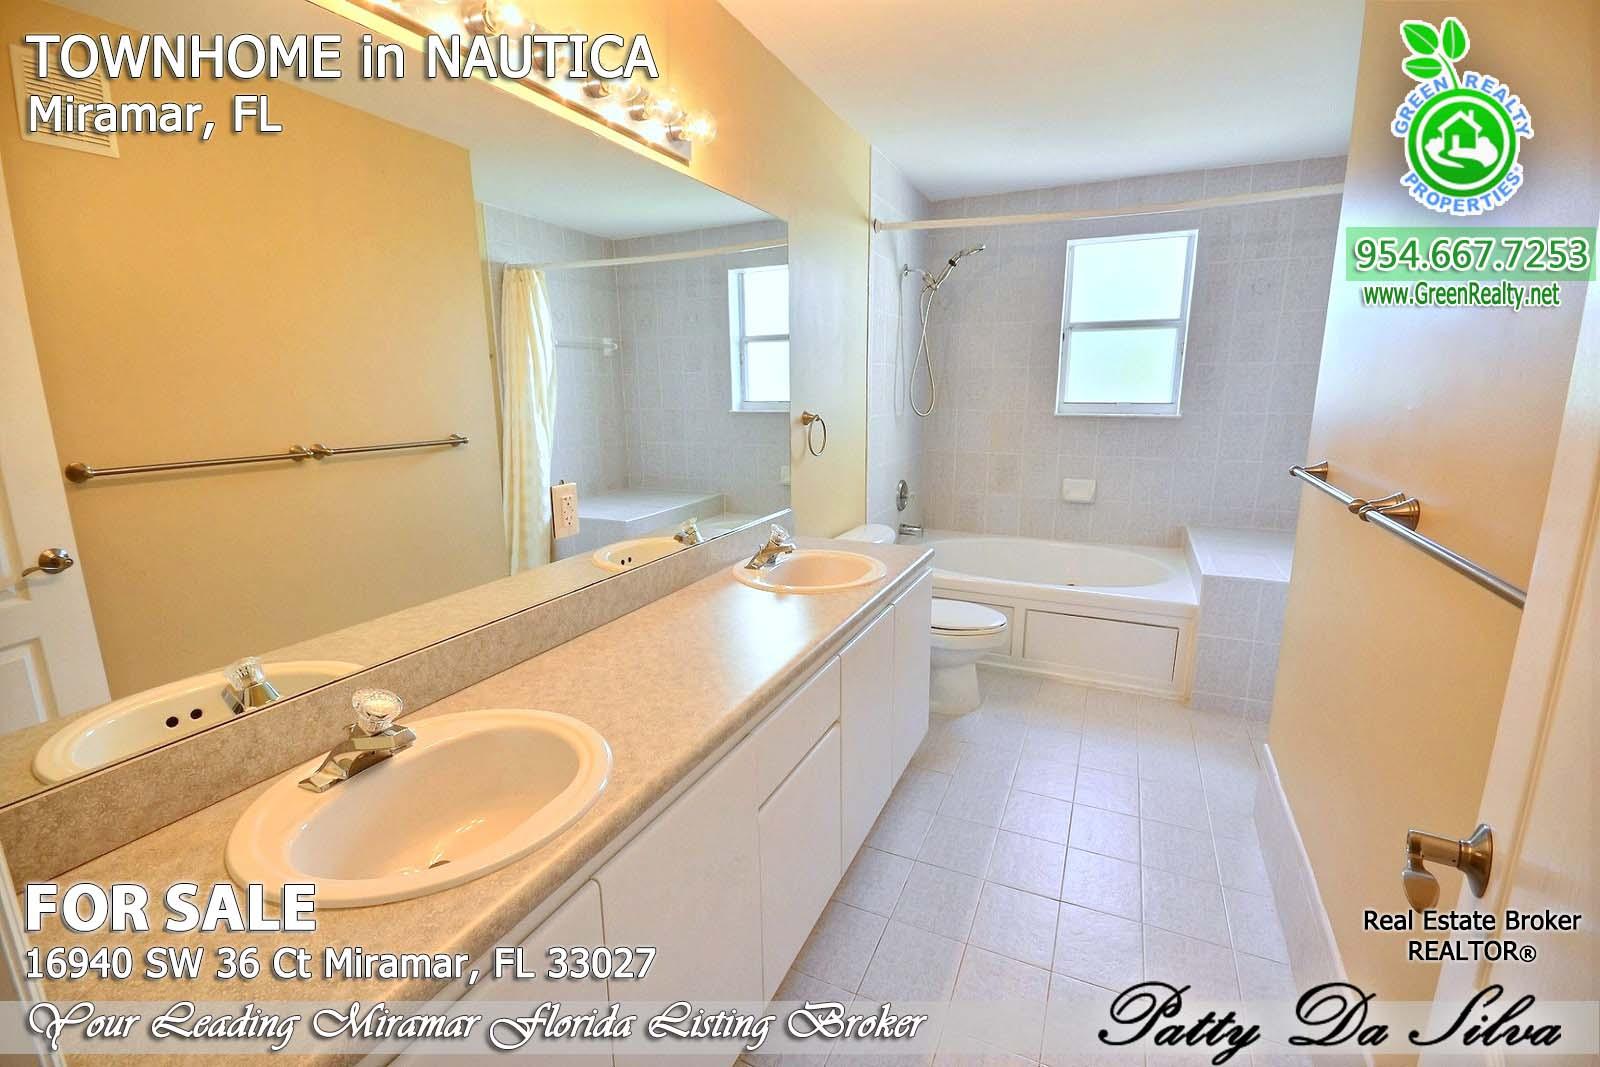 16940 SW 36 Ct Miramar, FL 33027 - Nautica Miramar Homes For Sale (26)